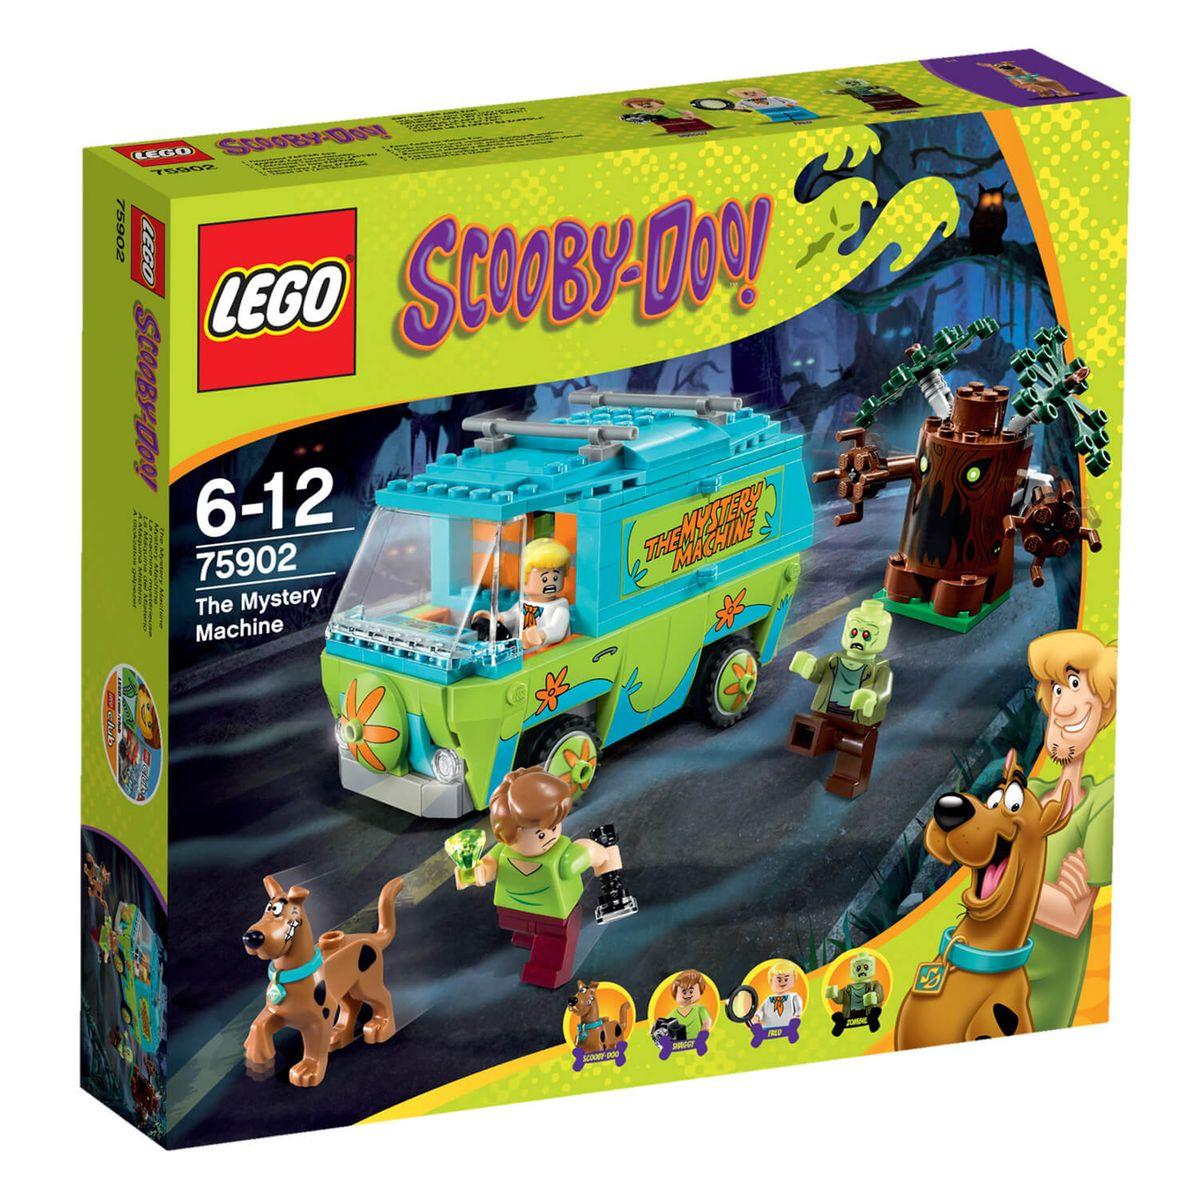 image Lego 75902 Scooby Doo : La machine mystérieuse LEGO